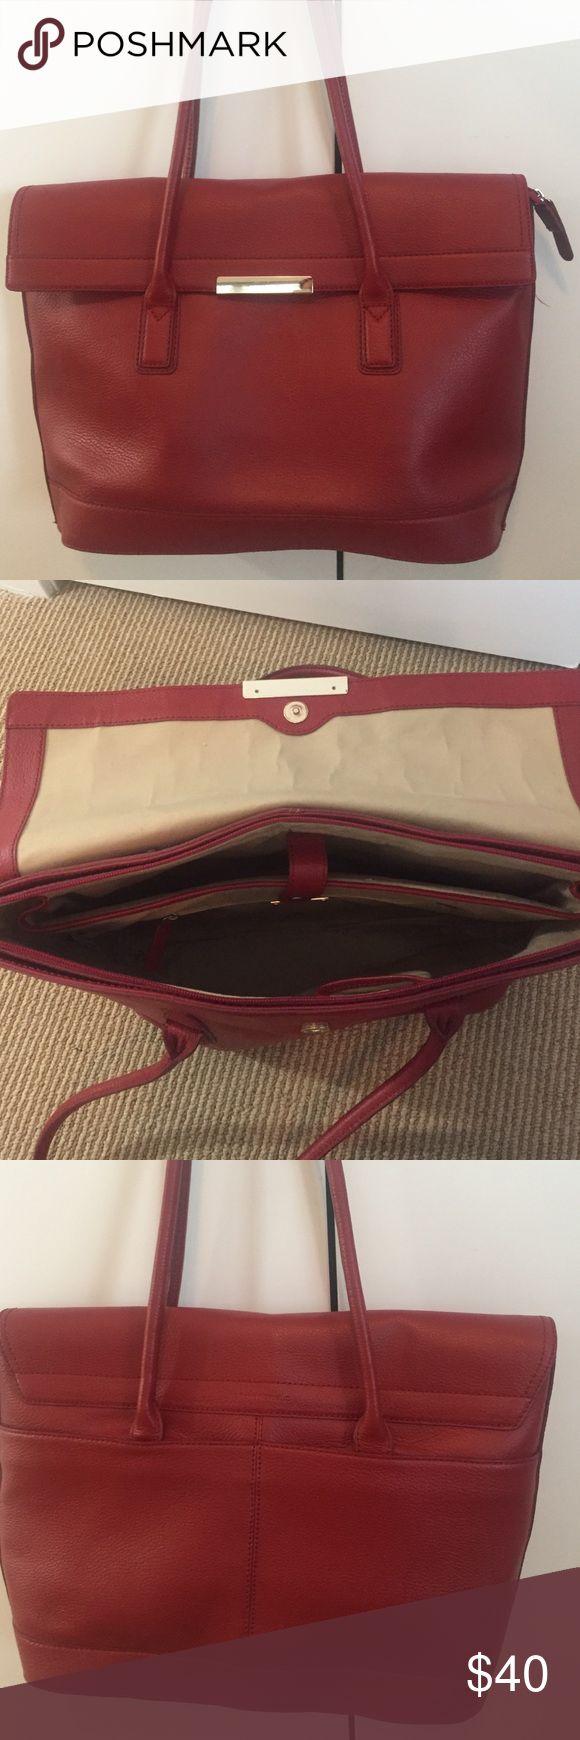 Banana Republic Leather Red Tote Bag Banana Republic Real Leather Red Tote Bag w/ Laptop Compartment Banana Republic Bags Laptop Bags